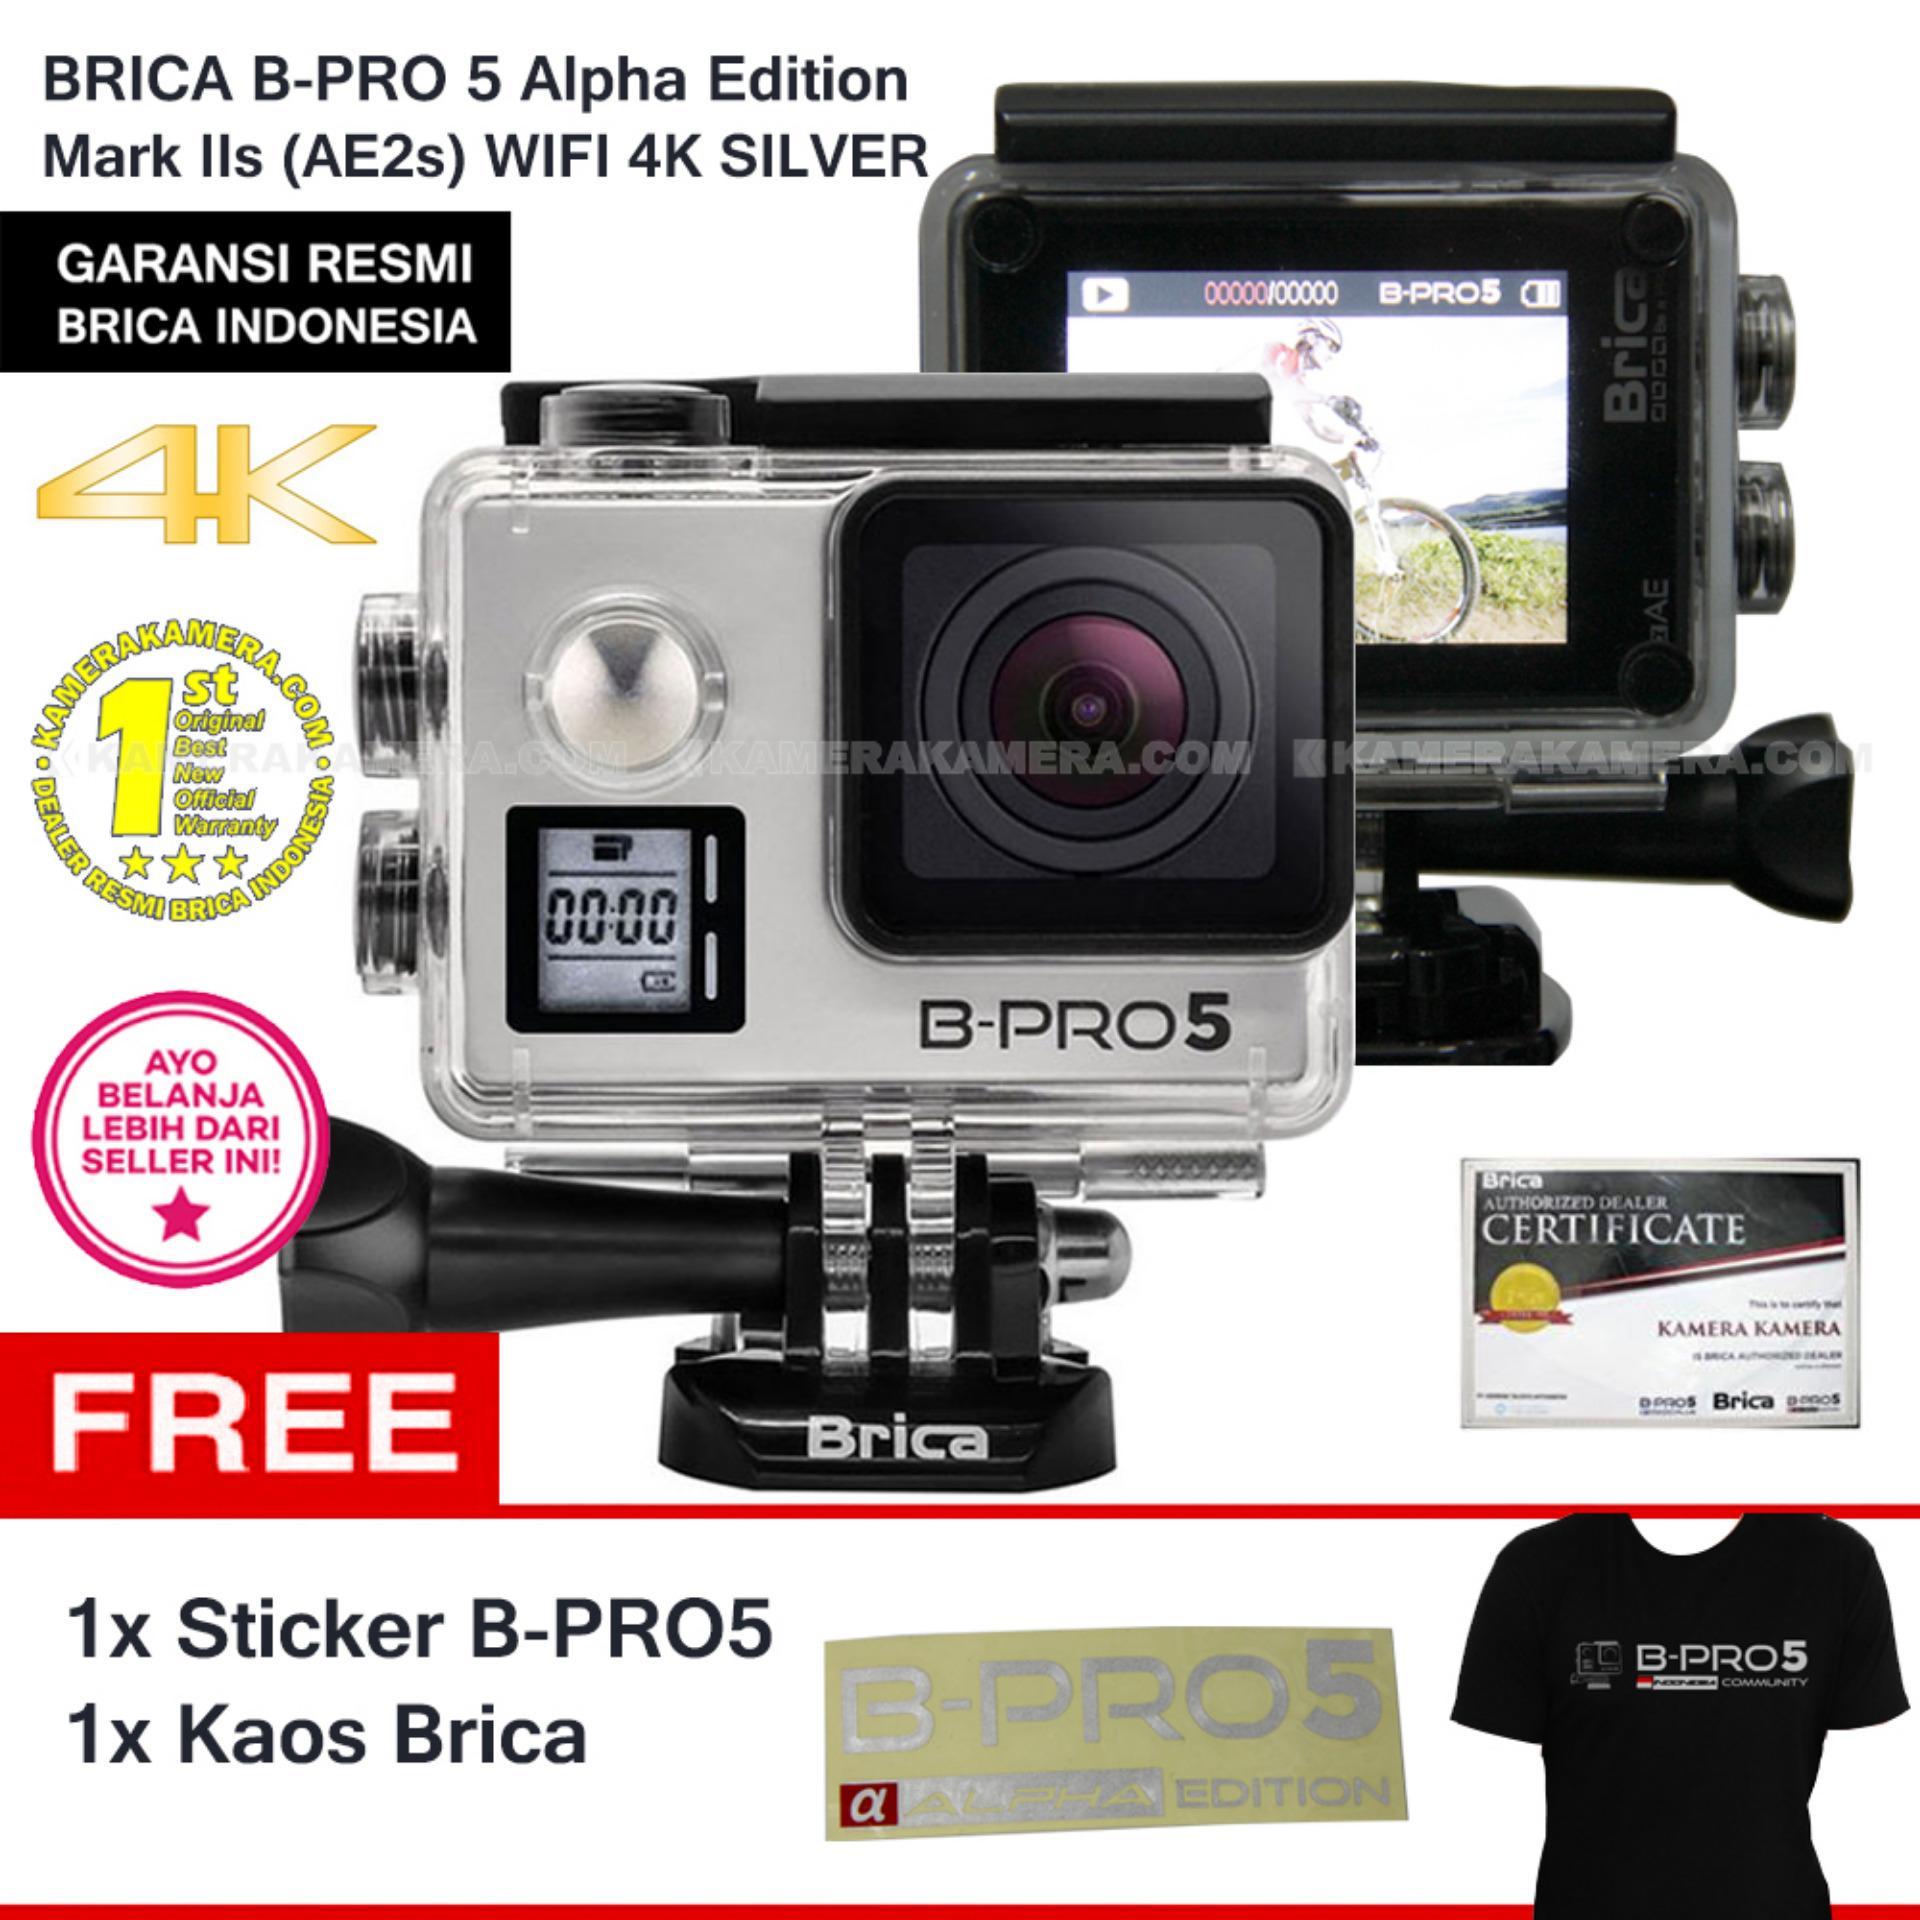 Brica B Pro5 Alpha Edition 4k Mark Iis Ae2s Black Sticker Pro 5 2 Ae2 Combo 3 Way Berrisom Hitam Kaos Lazada Indonesia